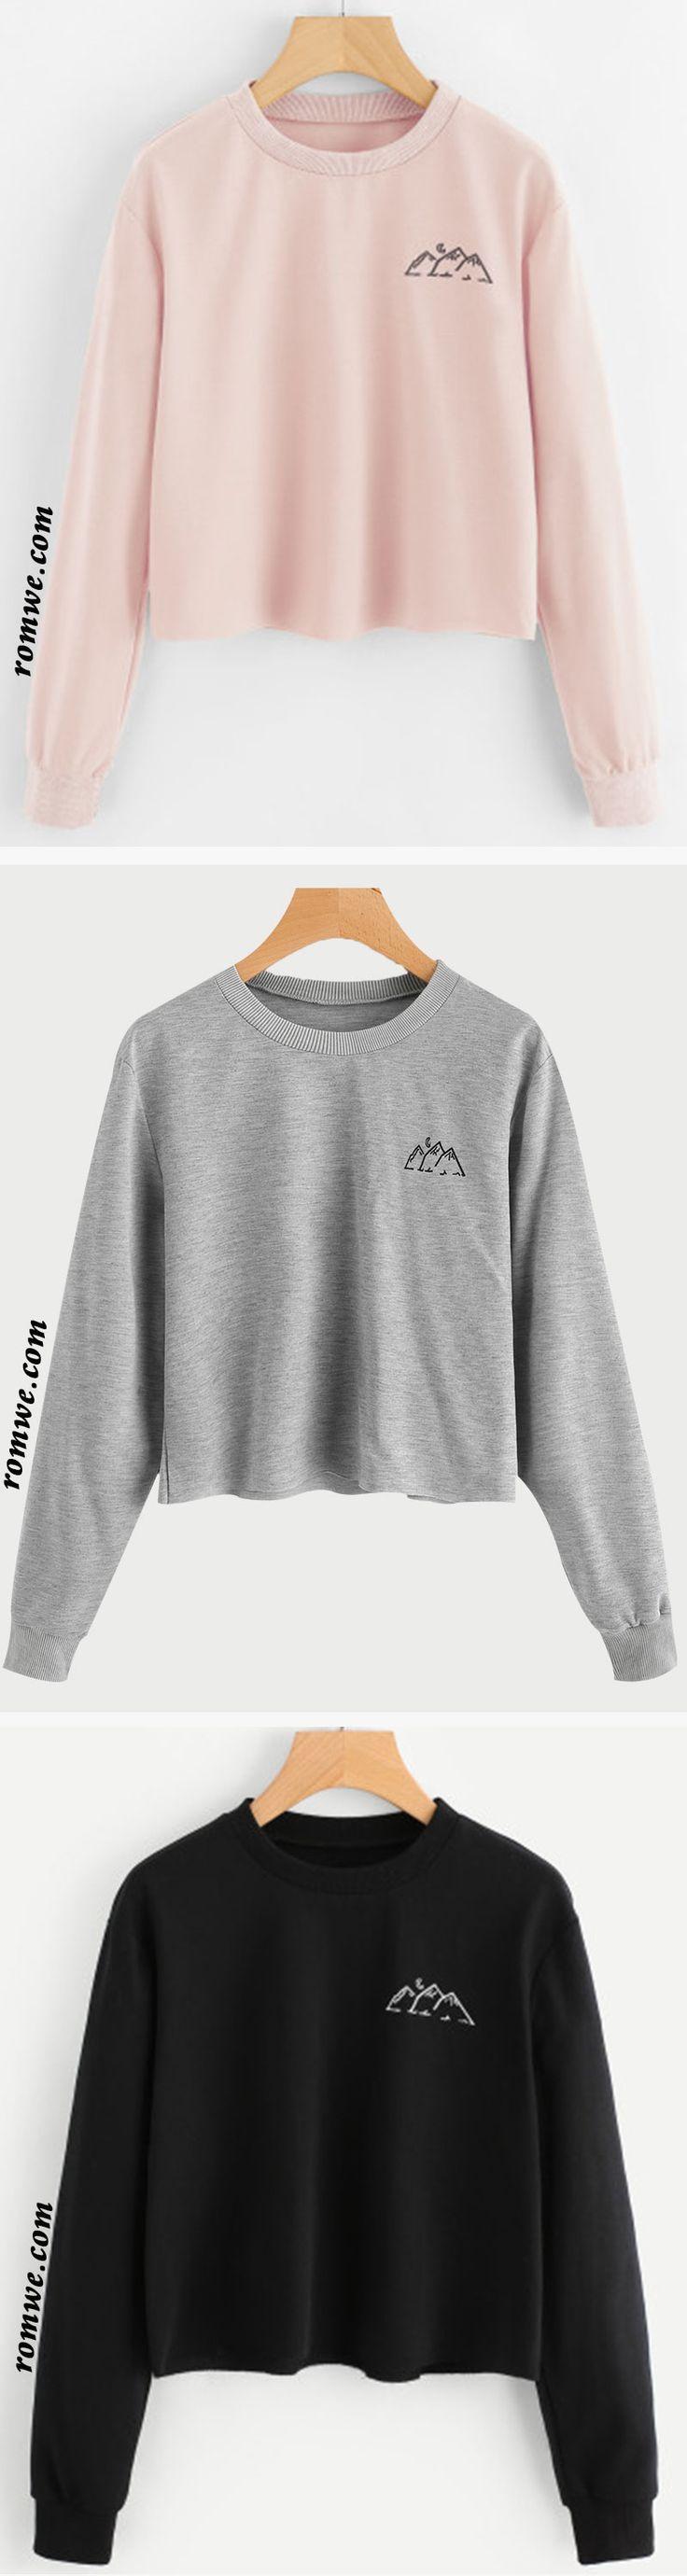 Raw Hem Graphic Print Sweatshirt